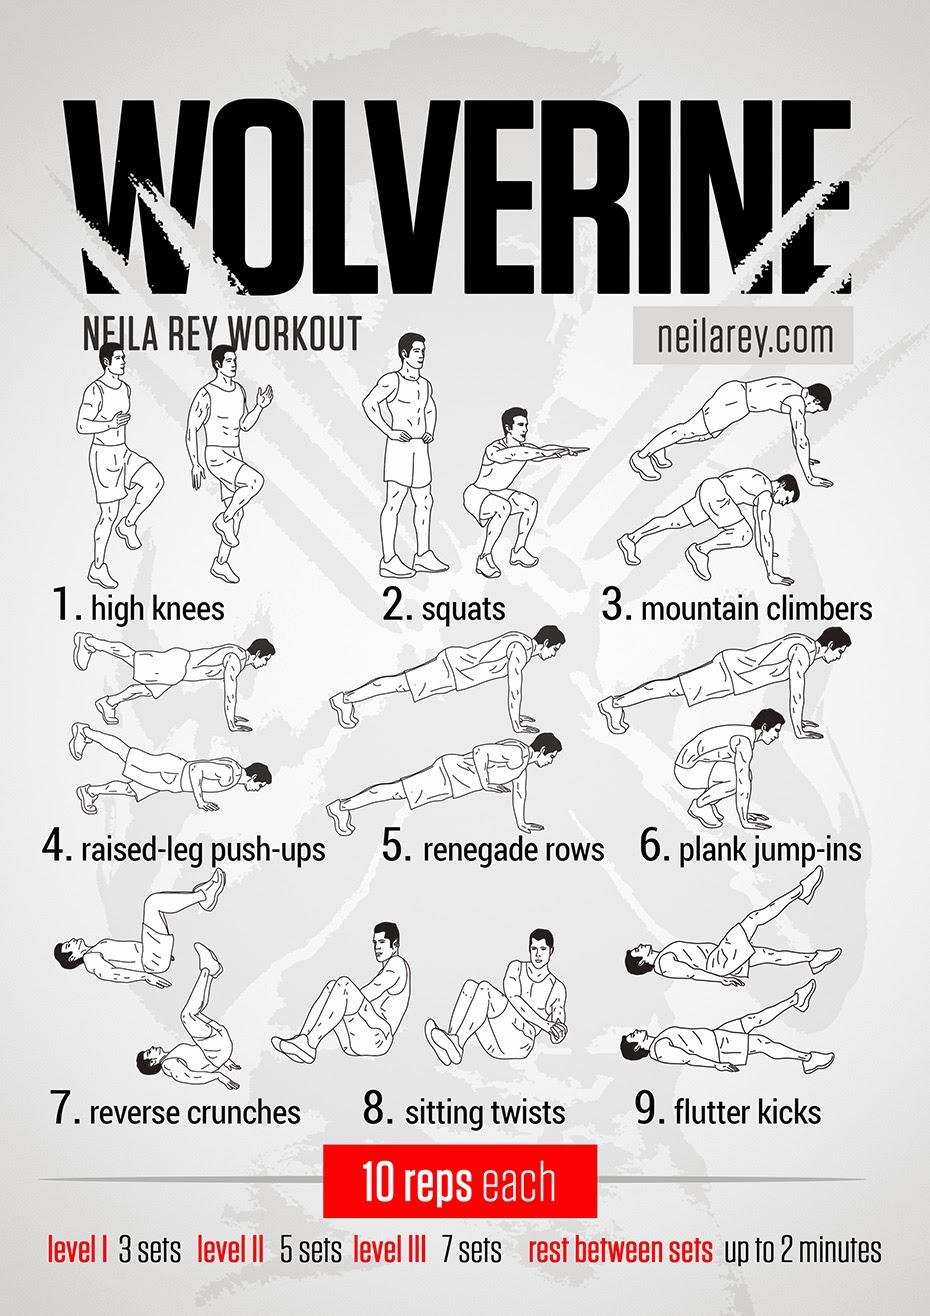 Wolverine Workouts Neila Rey